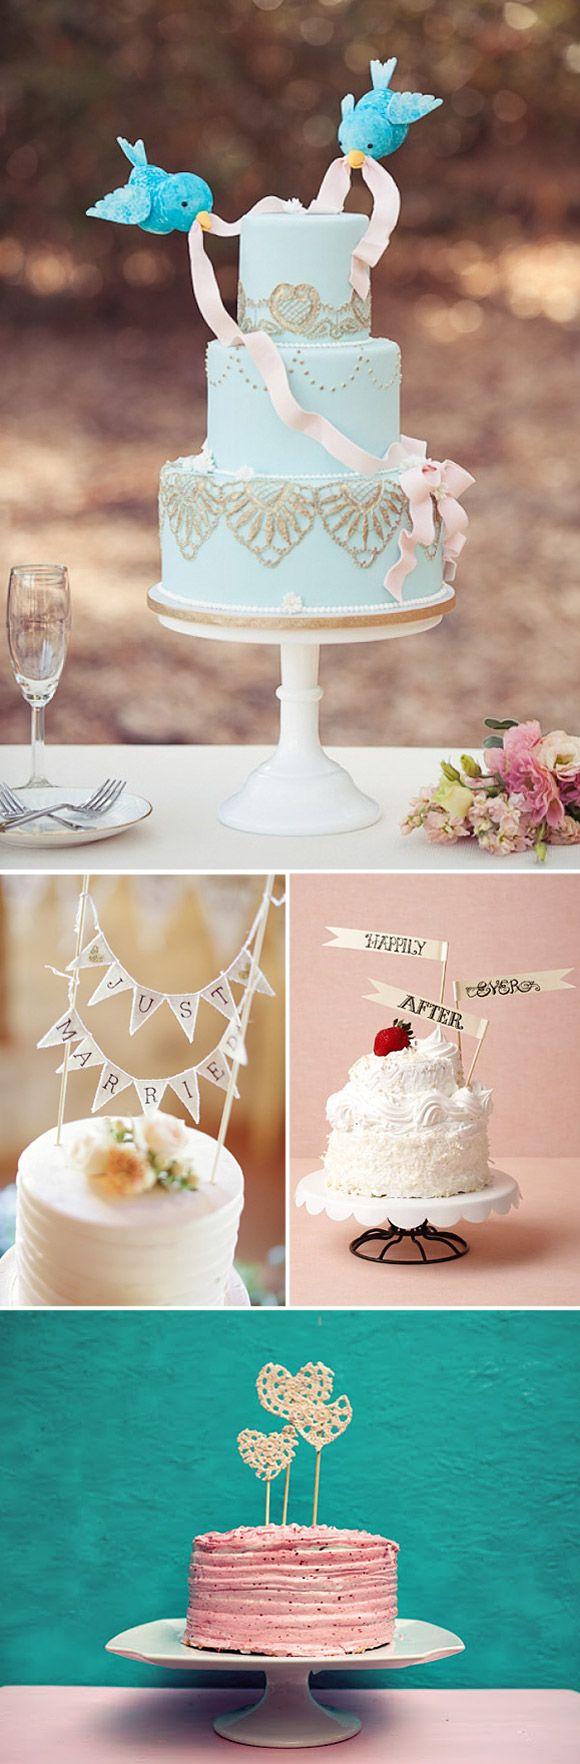 1000 ideas sobre tartas de boda en pinterest boda tarta for Decoracion de tortas espejo